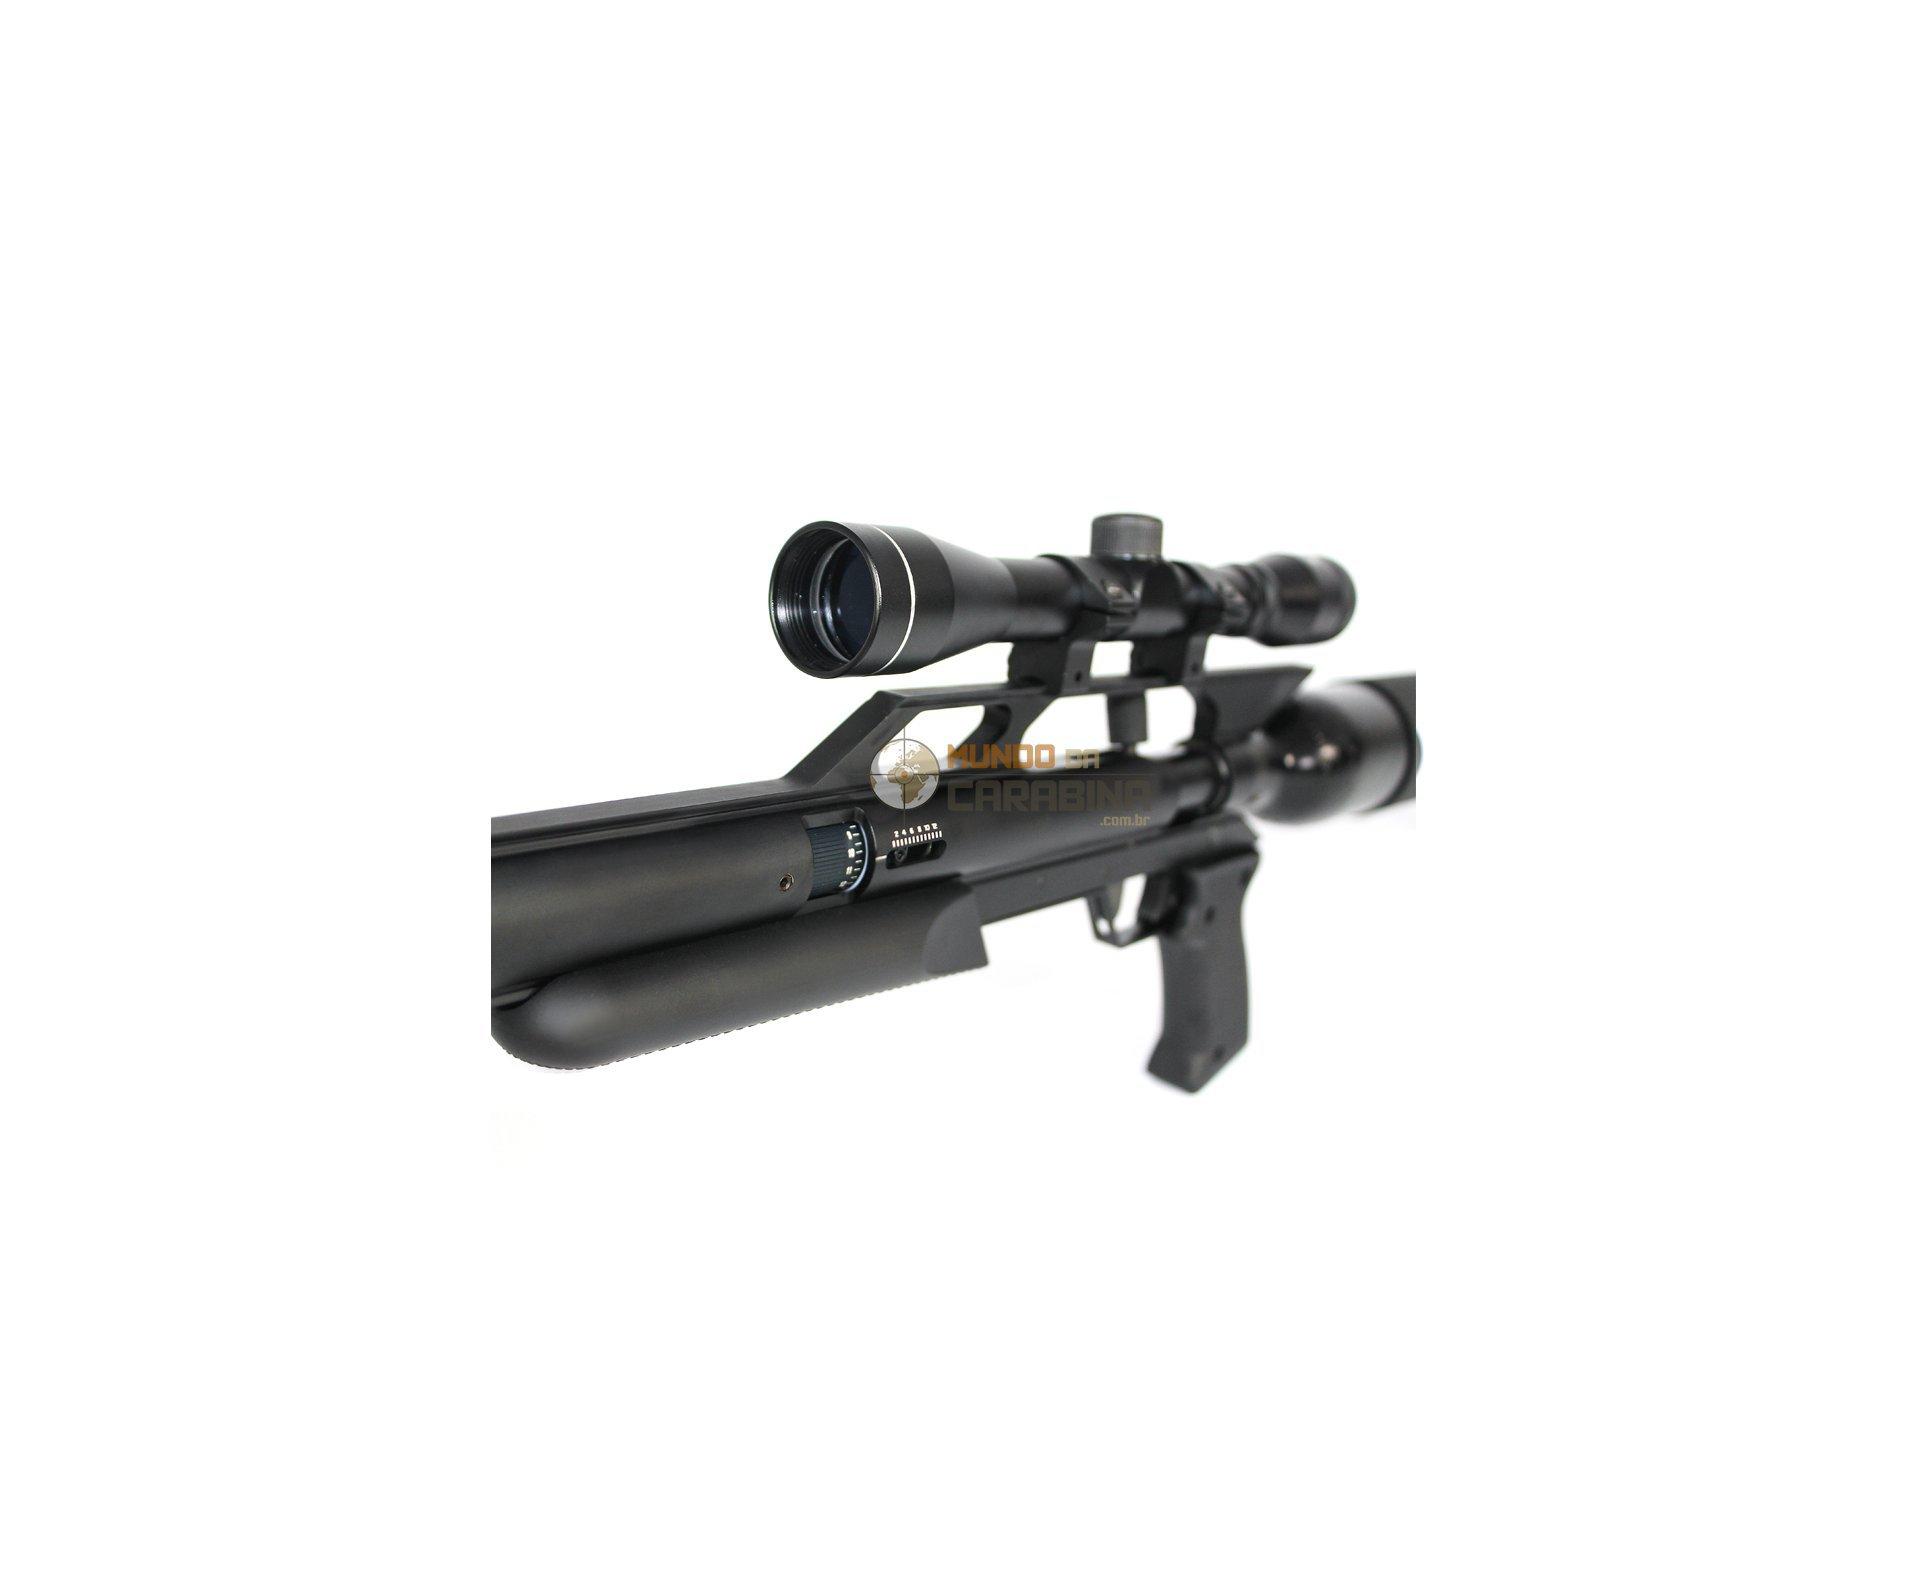 Rifle Gunpower Sss + Luneta 4x32 + Case Rossi + Sem Supressor - Calibre 5,5 Mm - Monotiro